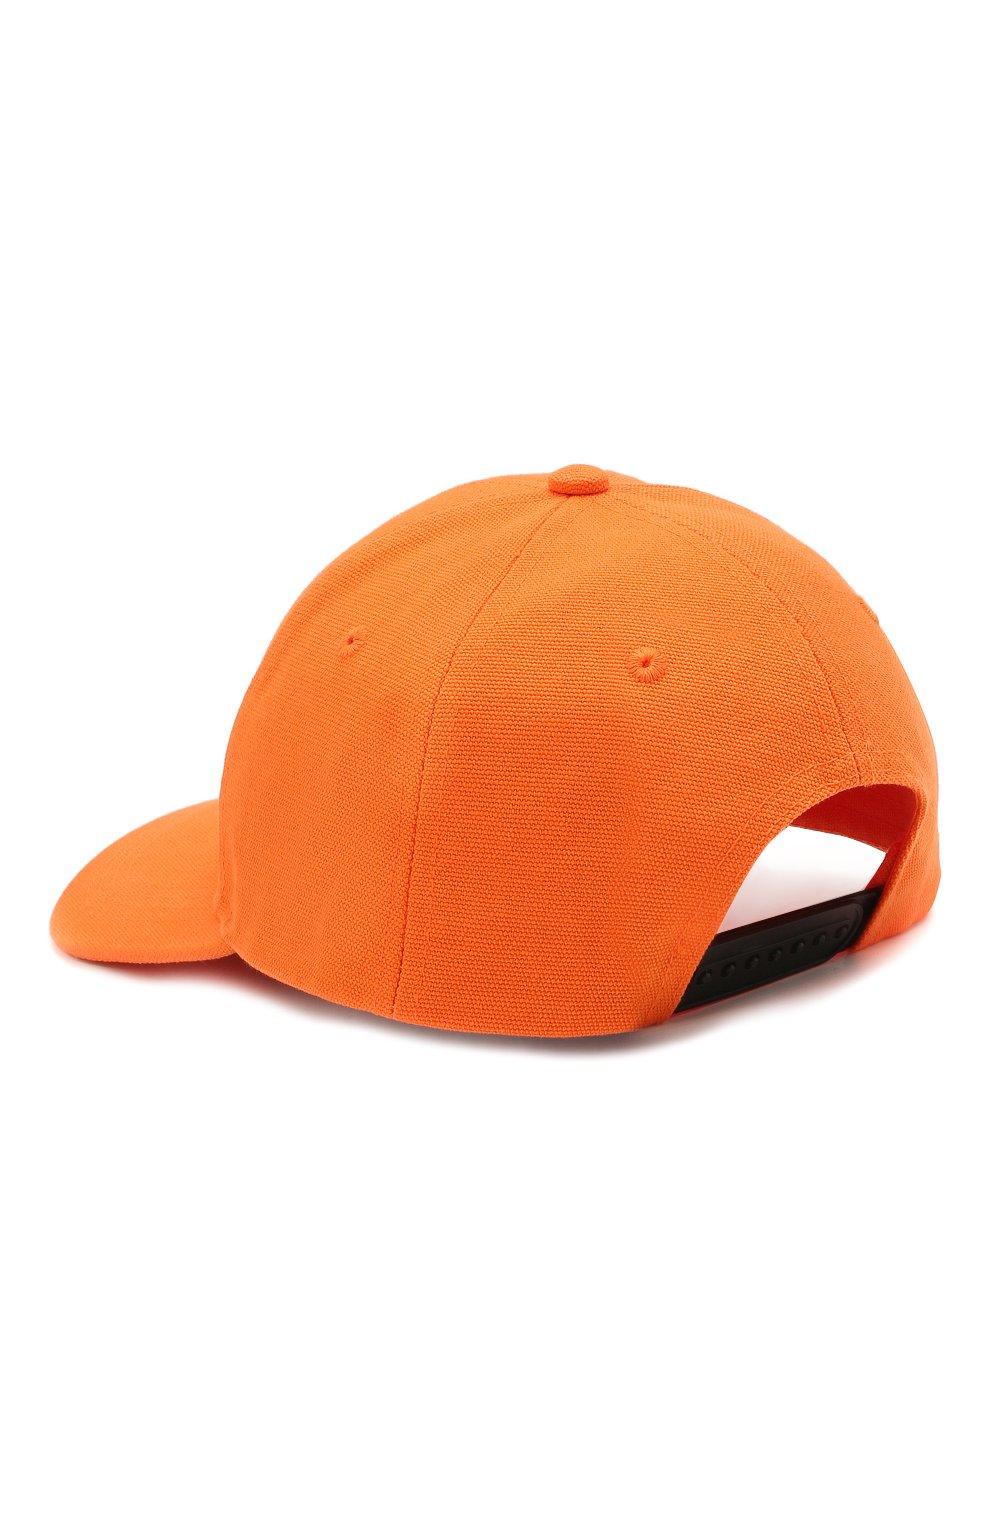 Женская хлопковая бейсболка HERON PRESTON FOR CALVIN KLEIN оранжевого цвета, арт. K50K508122   Фото 2